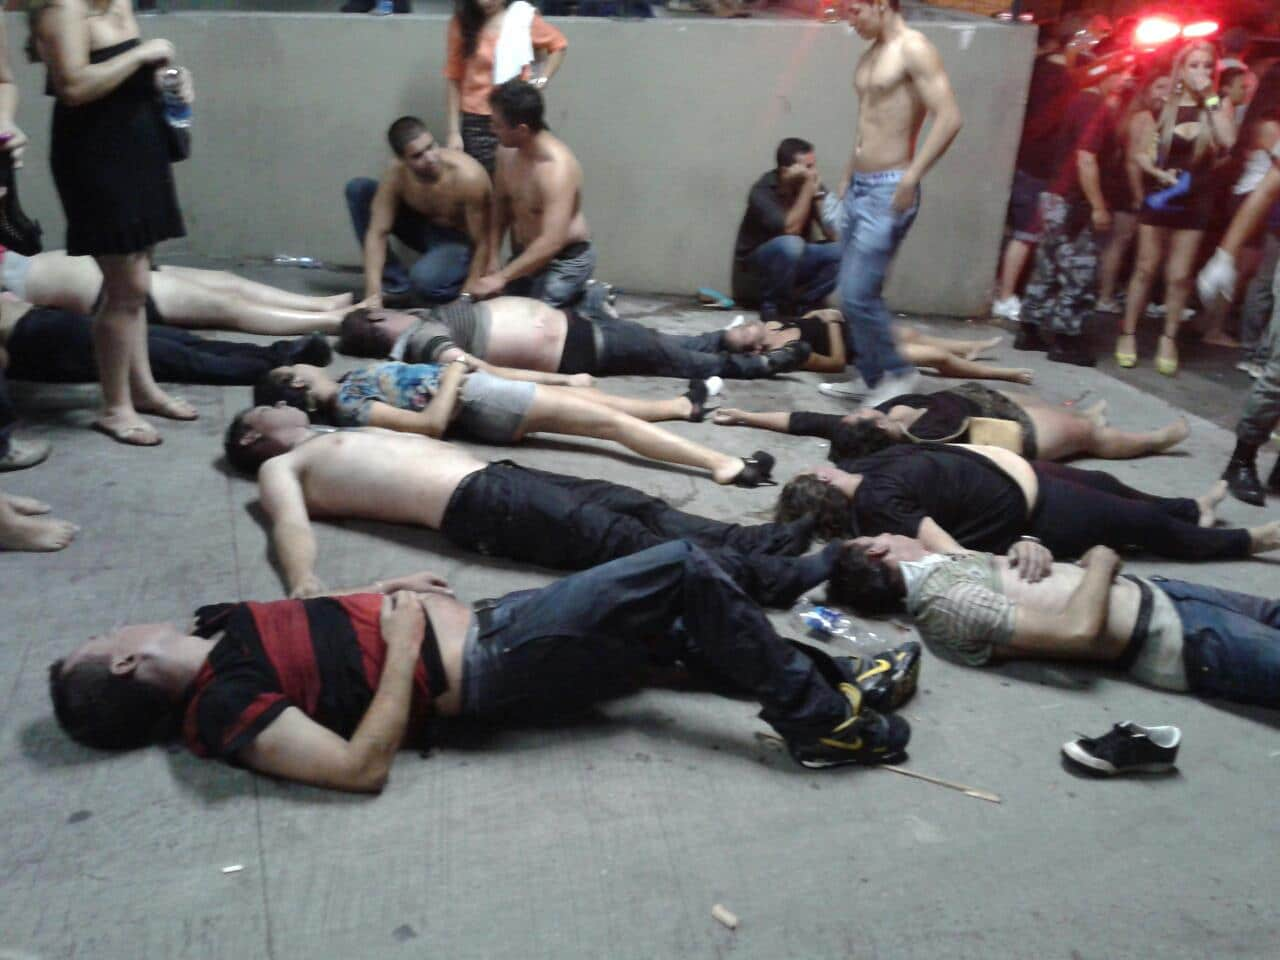 Brazilian nightclub fire